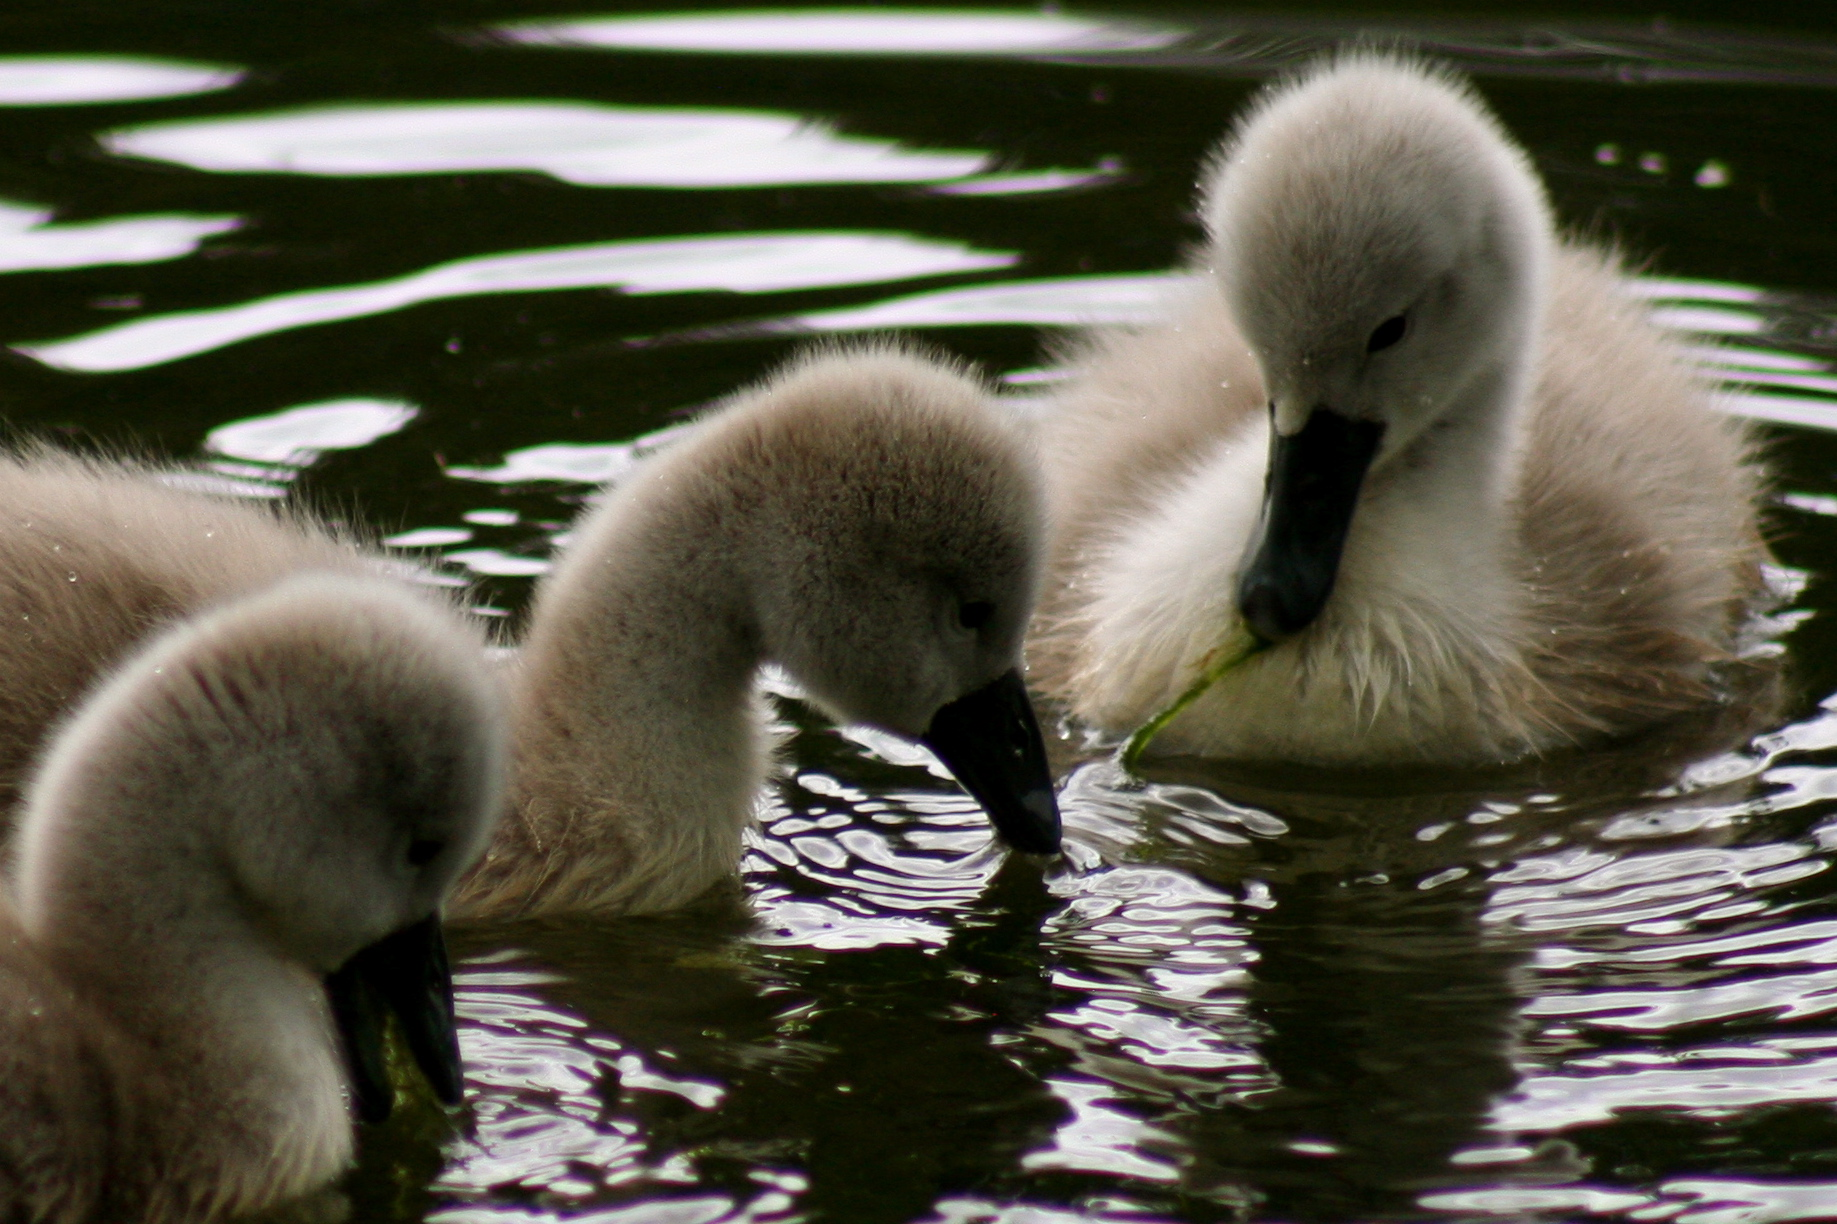 File:Photojenni - Cute baby swan (by).jpg - Wikimedia Commons